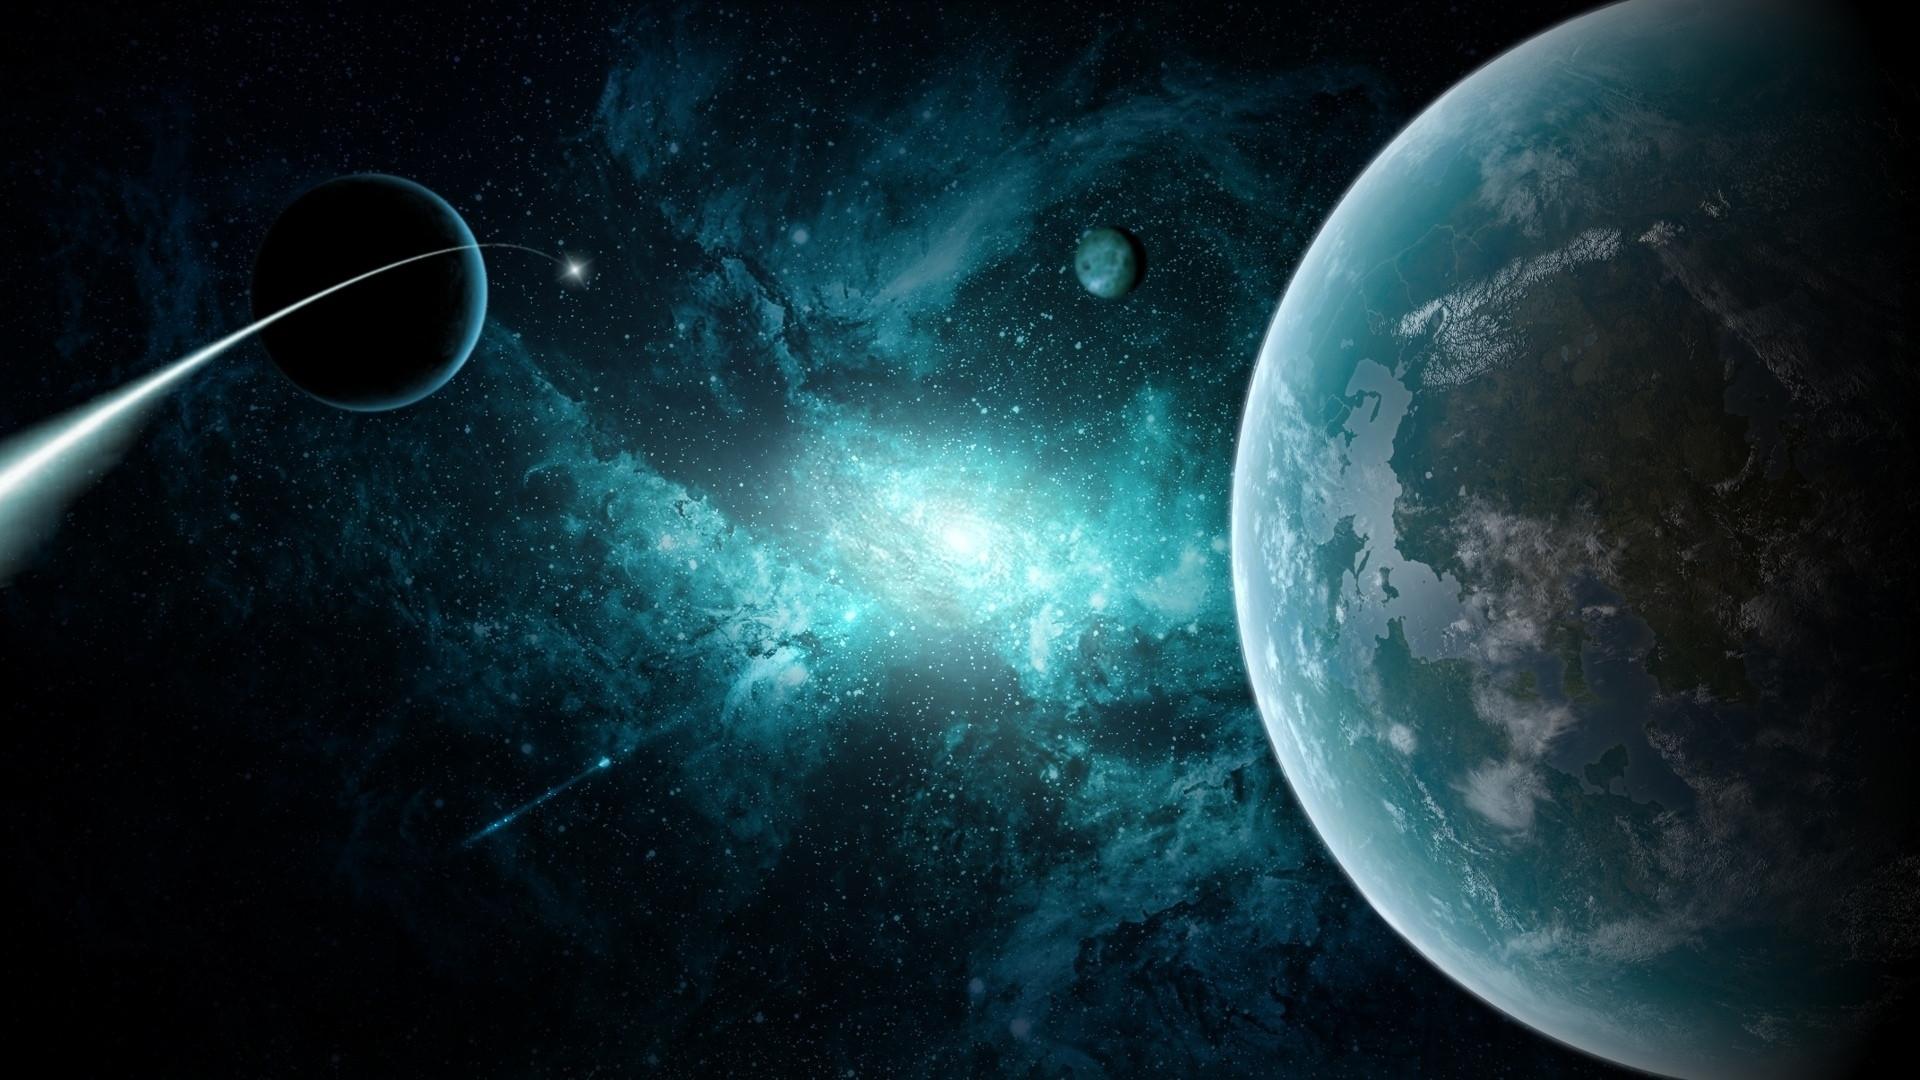 обои Комета возле планет, планета, спутники, комета картинки фото